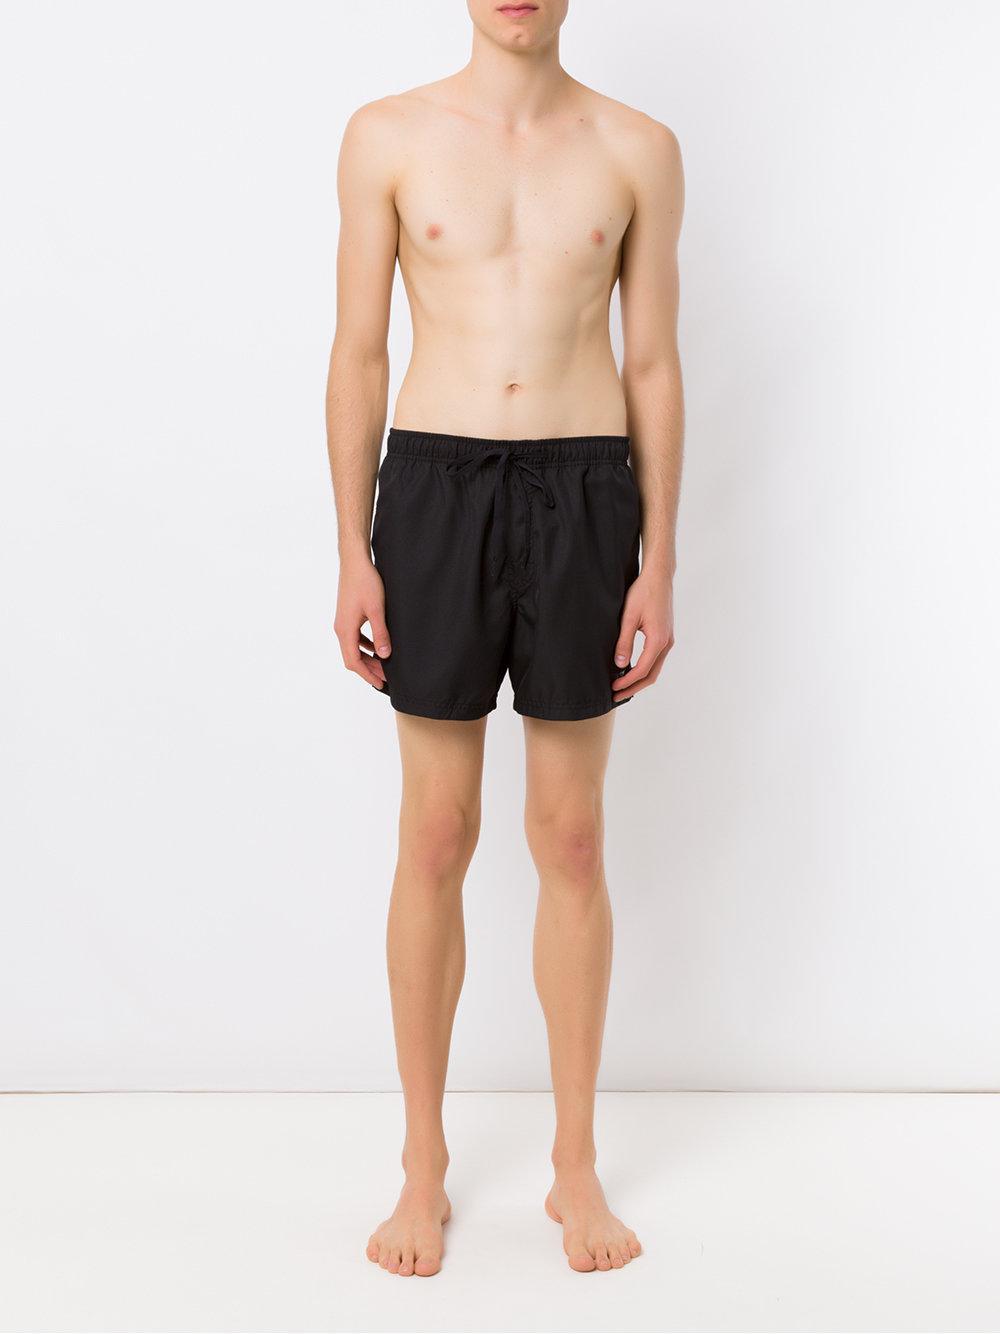 58a1d95be1 Osklen Beach Shorts in Black for Men - Lyst